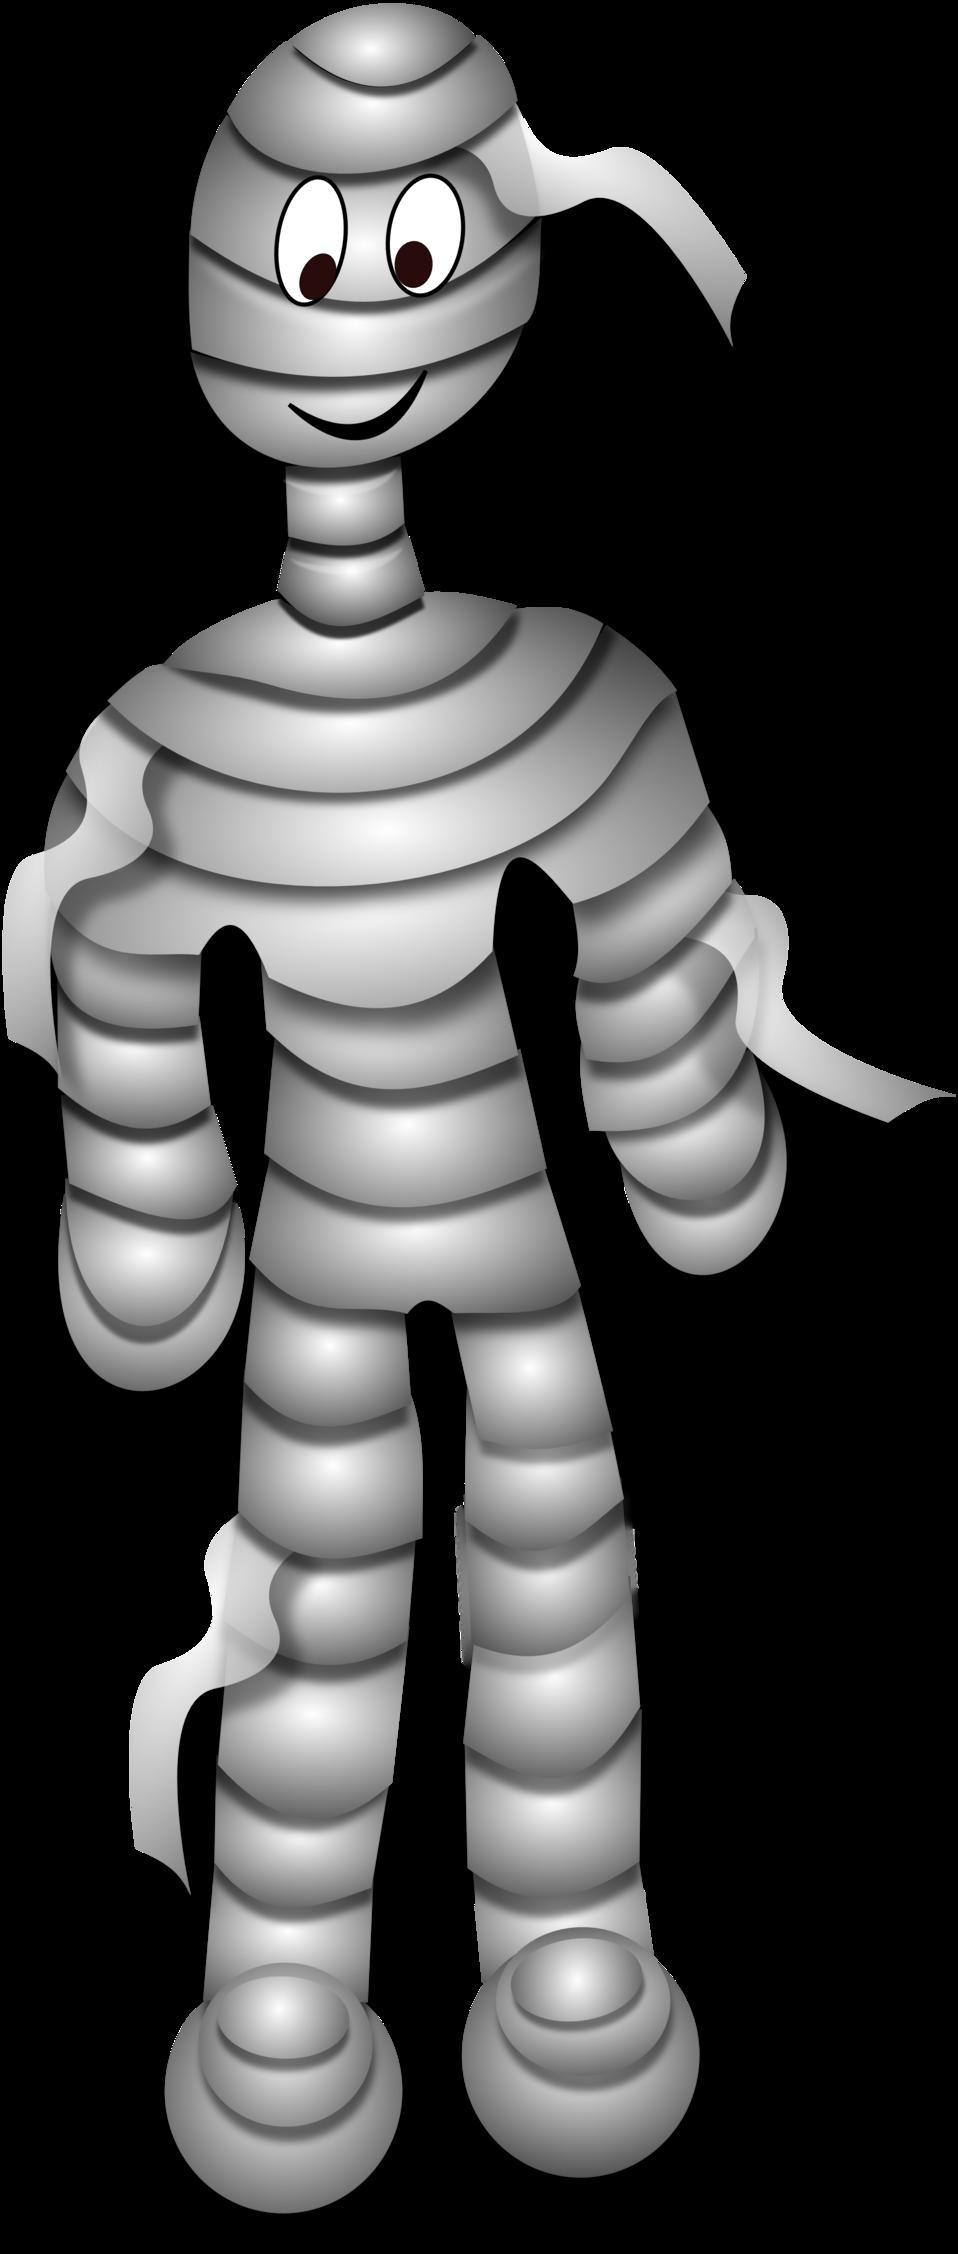 Halloween clipart mummy jpg black and white download Public Domain Clip Art Image | Little Mummy | ID: 13935868829884 ... jpg black and white download